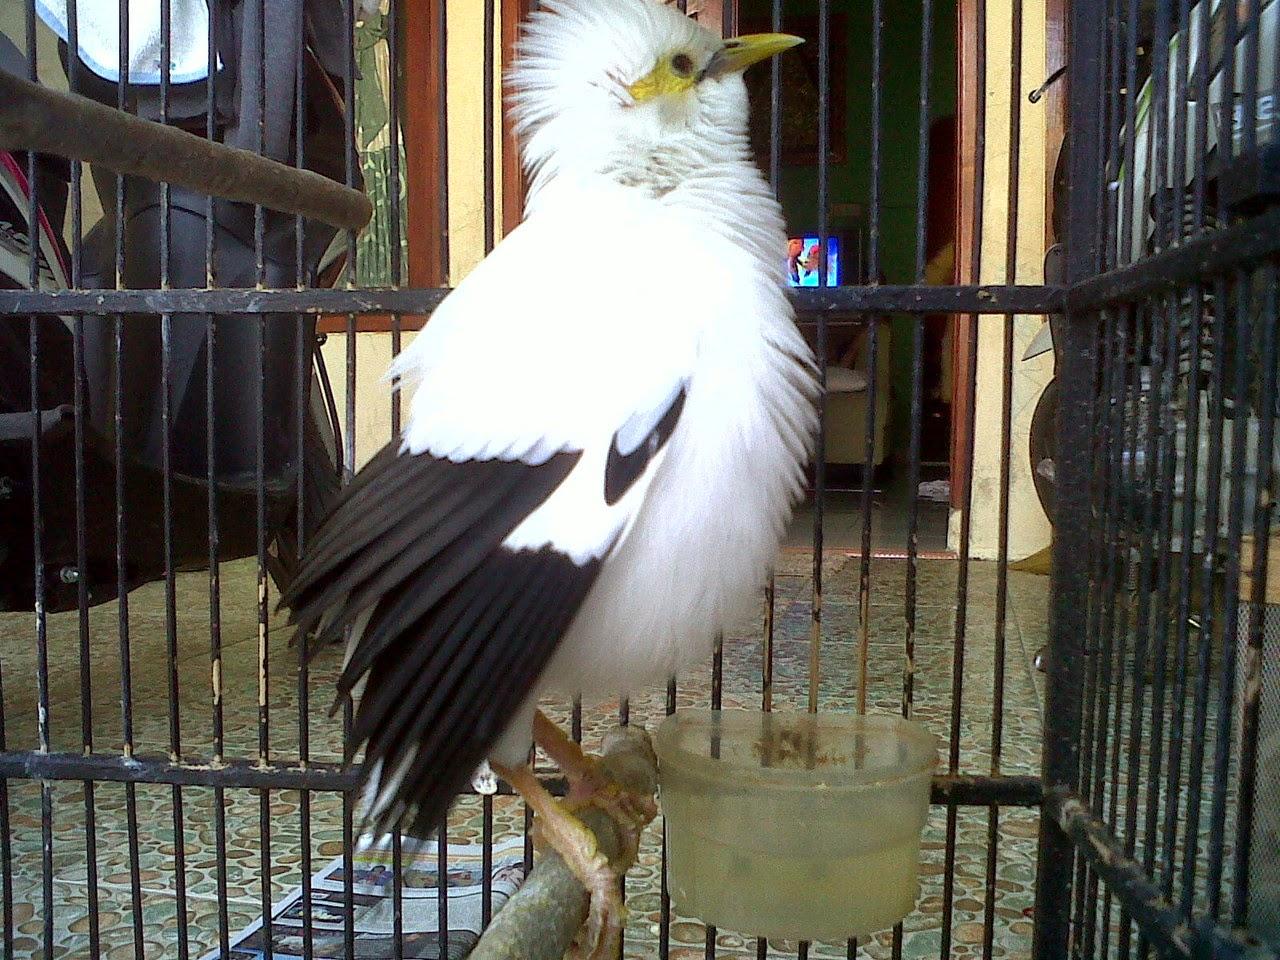 http://tipspetani.blogspot.com/2014/12/berbisnis-ternak-jalak-putih.html